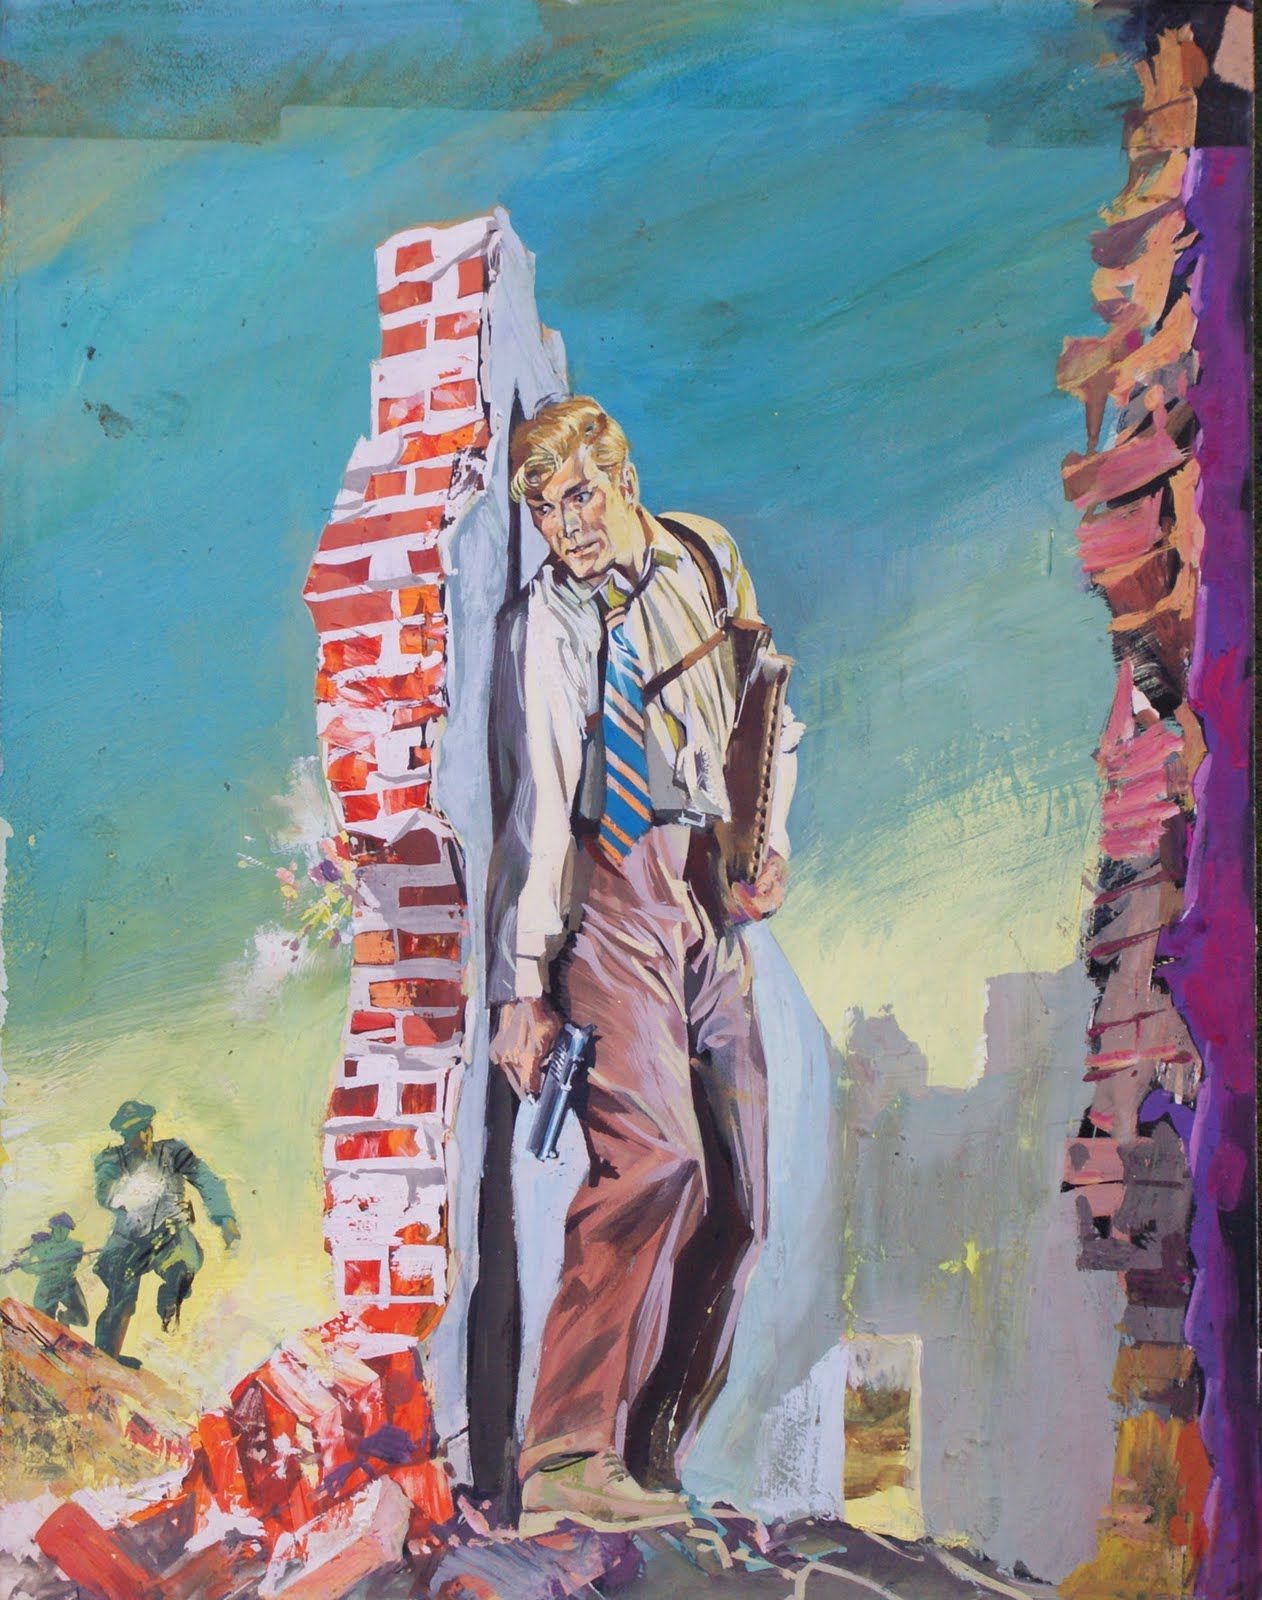 air ace comics - AUG16